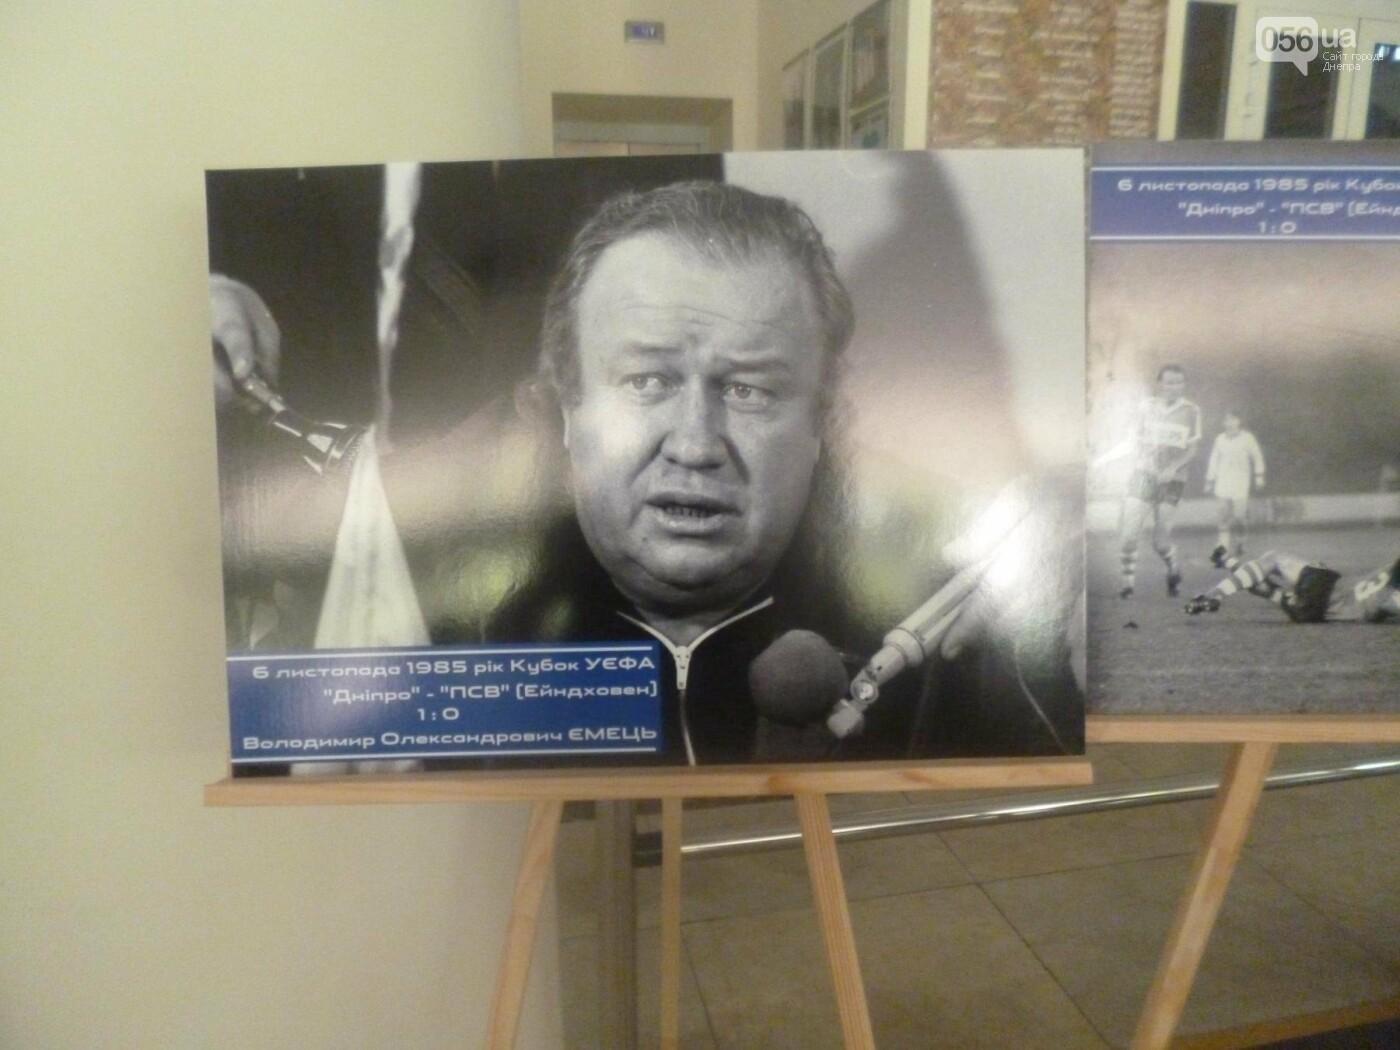 В Днепре отметили 100-летие создания ФК «Днепр», - ФОТО, фото-13